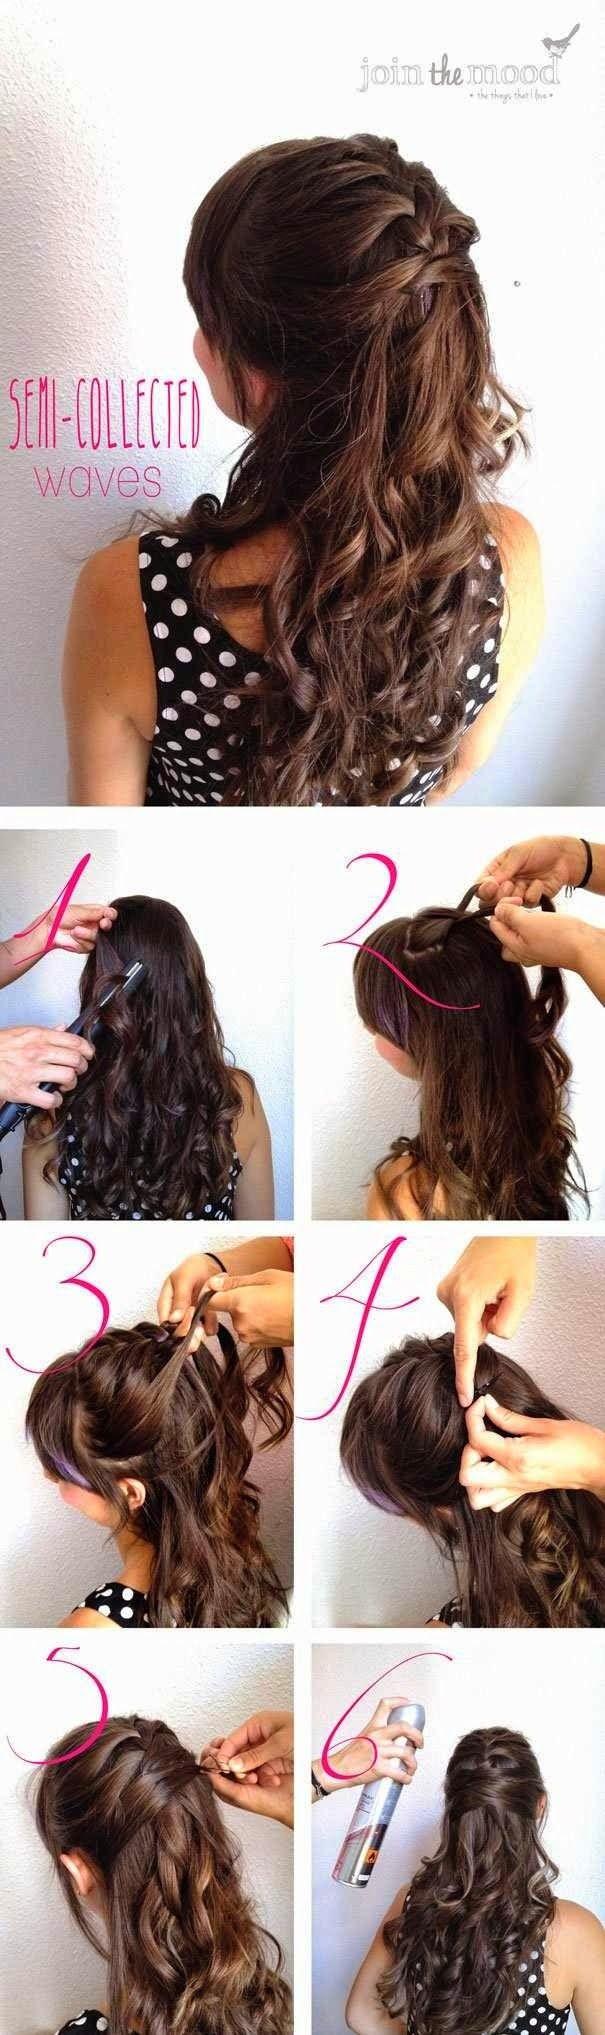 fashionable half-up half-down hairstyles & hair tutorials